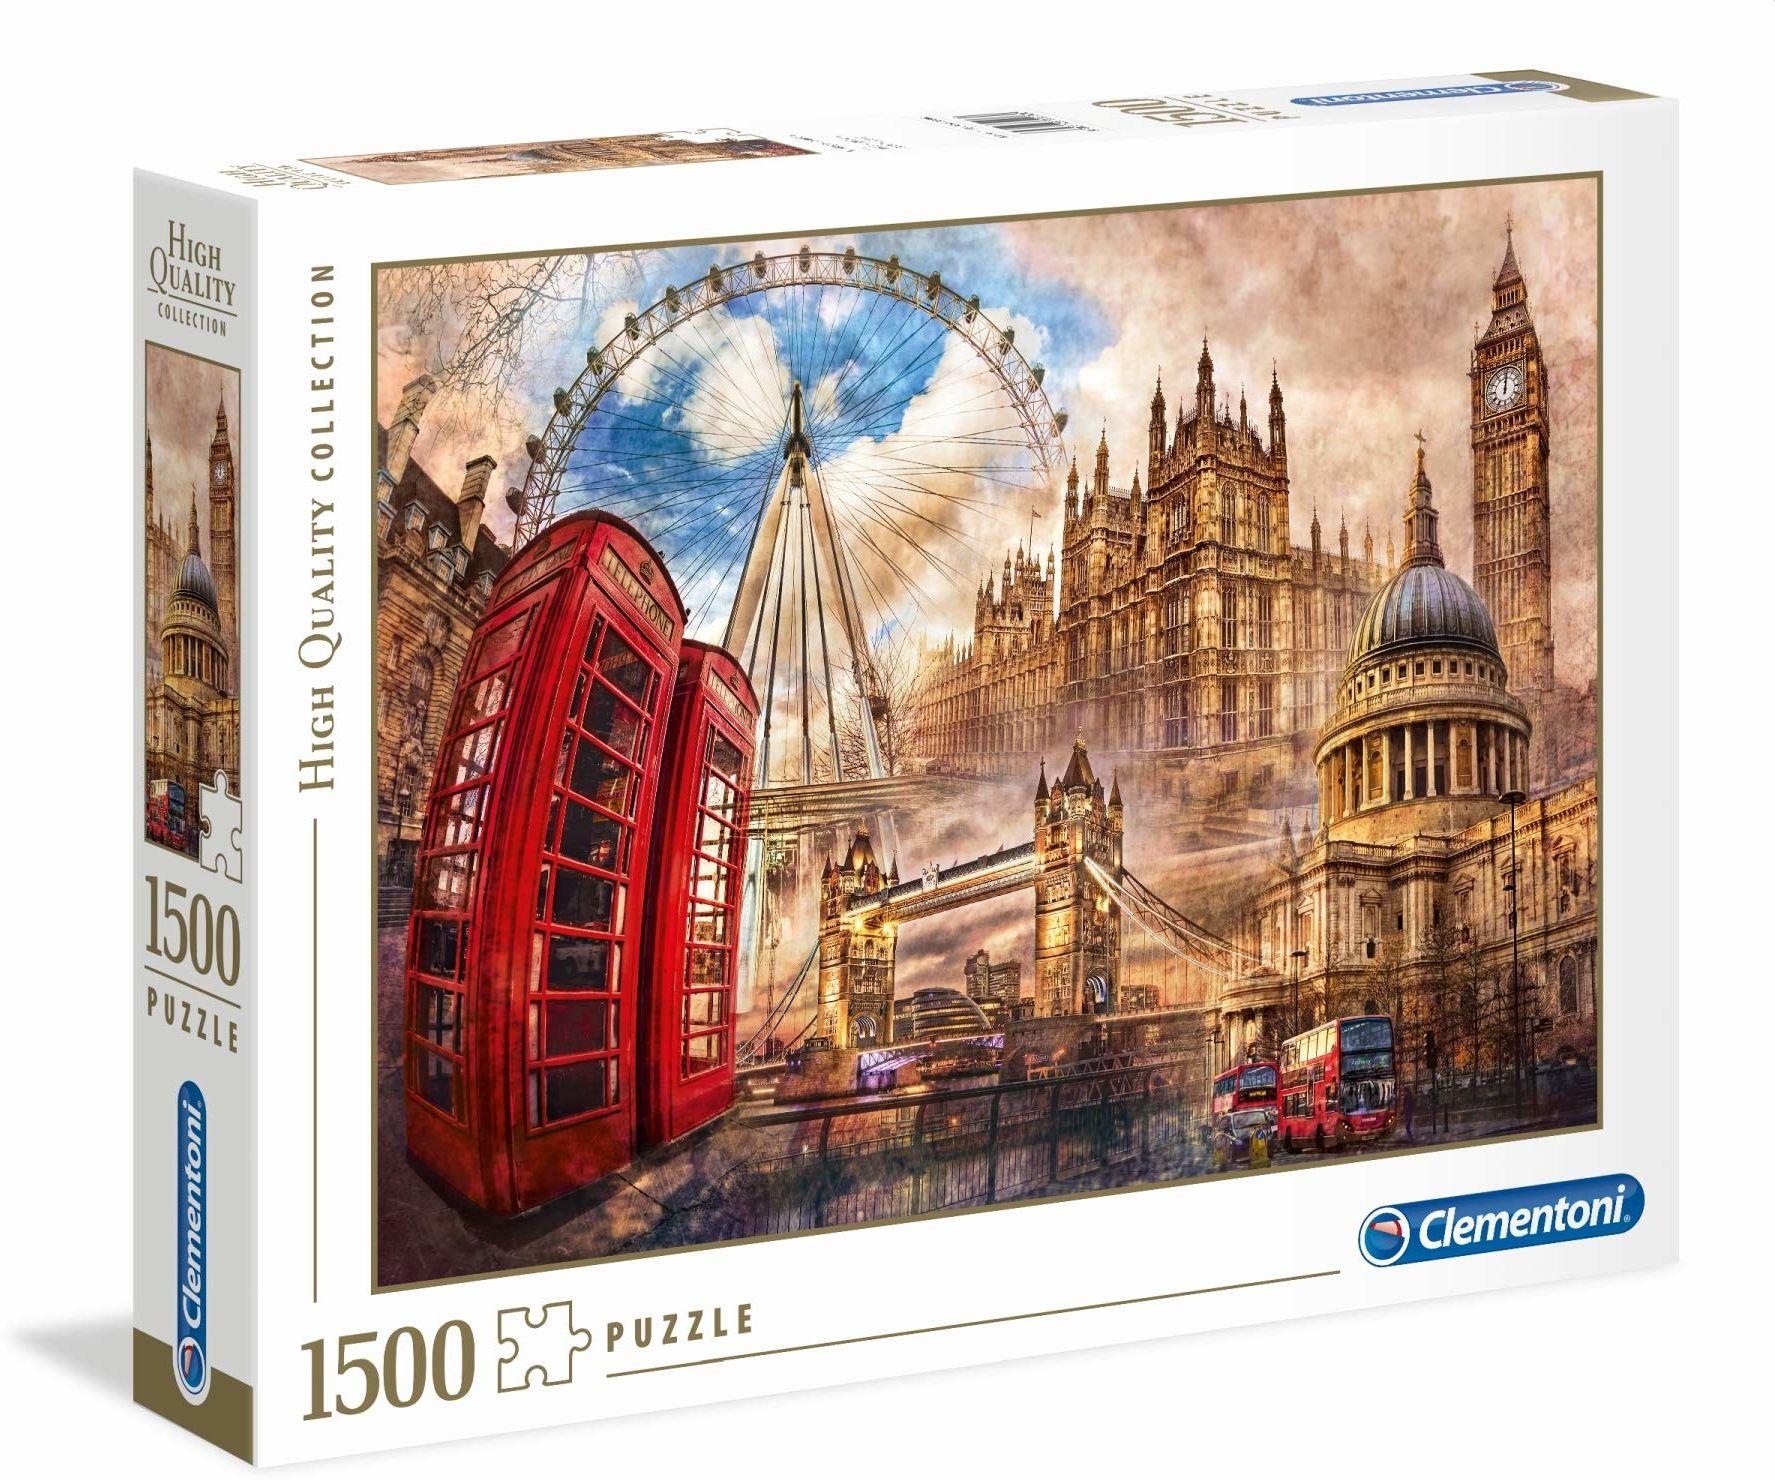 "Clementoni 31807"" Stare Londyn Puzzle 1500 części High Quality Collection"